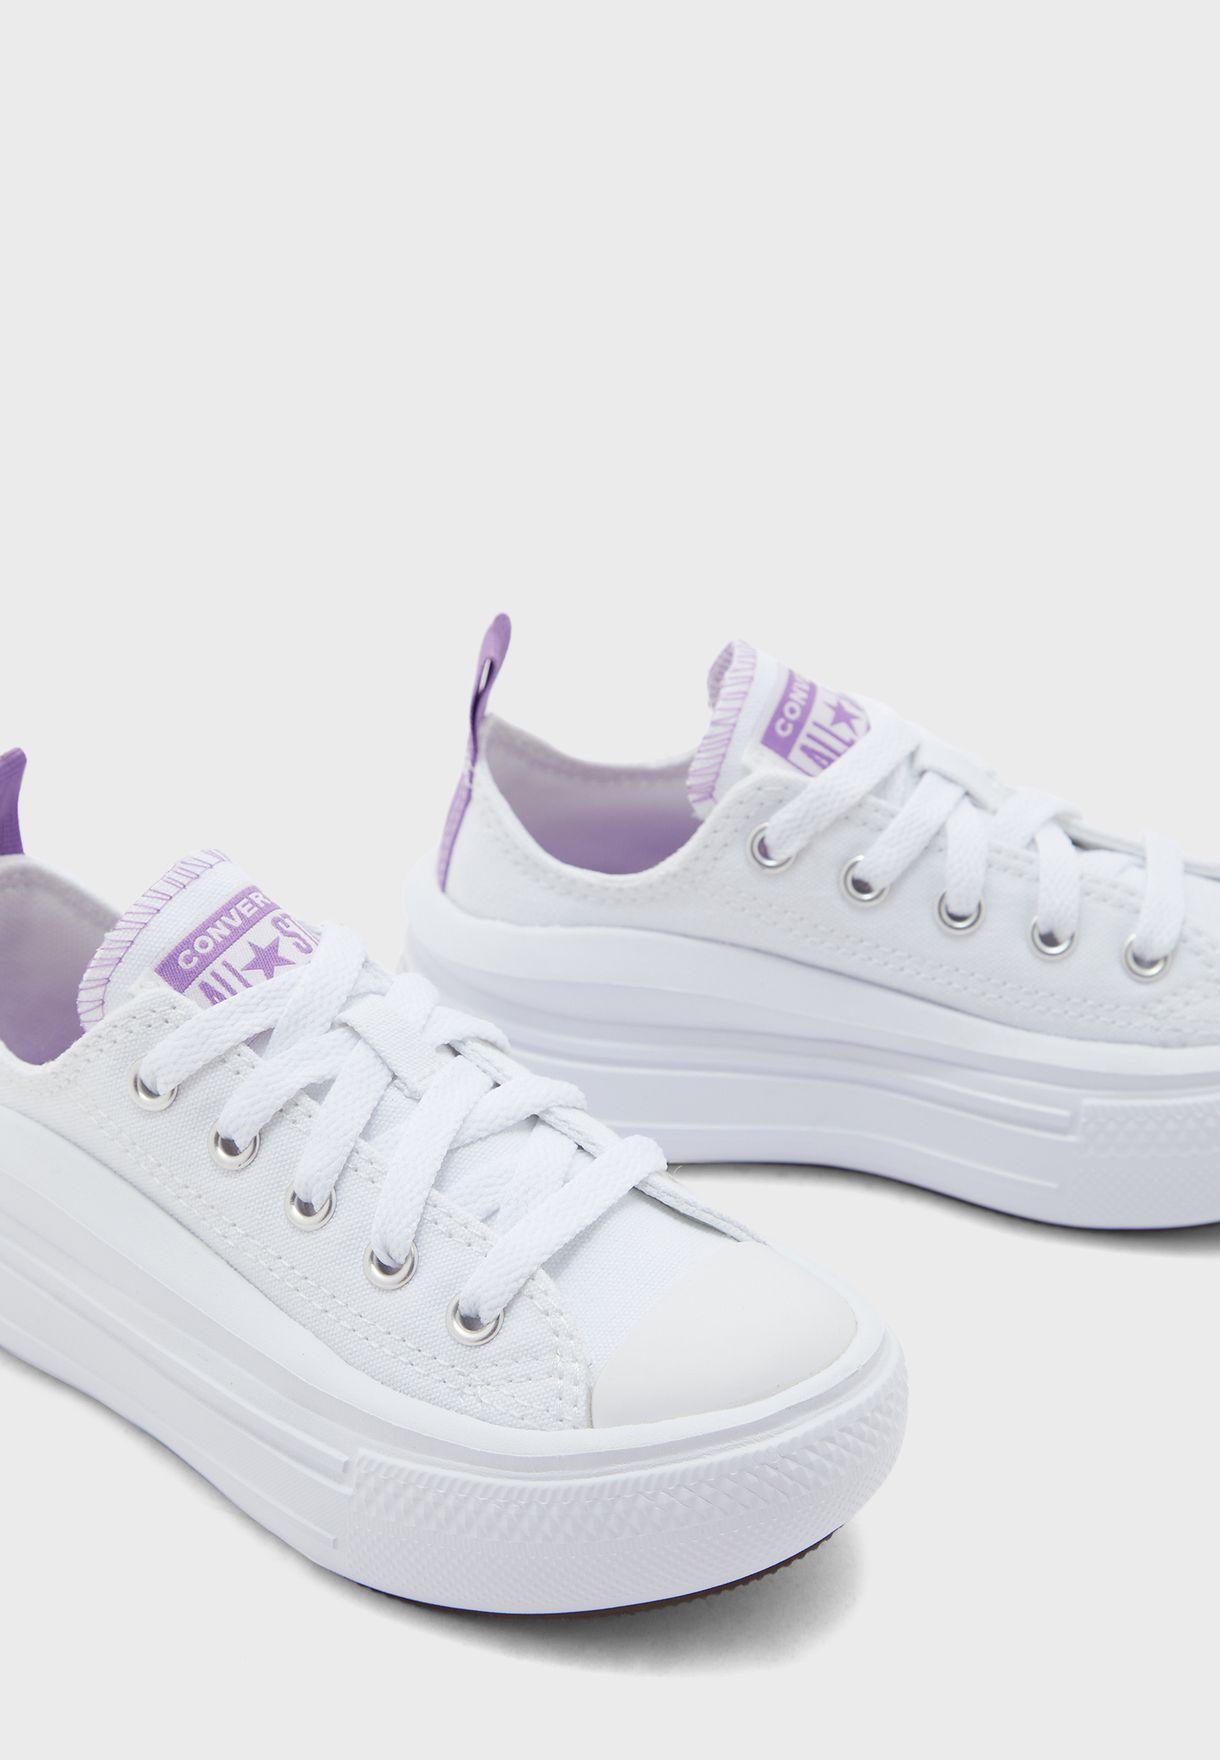 حذاء تشاك تايلور اول ستار موف